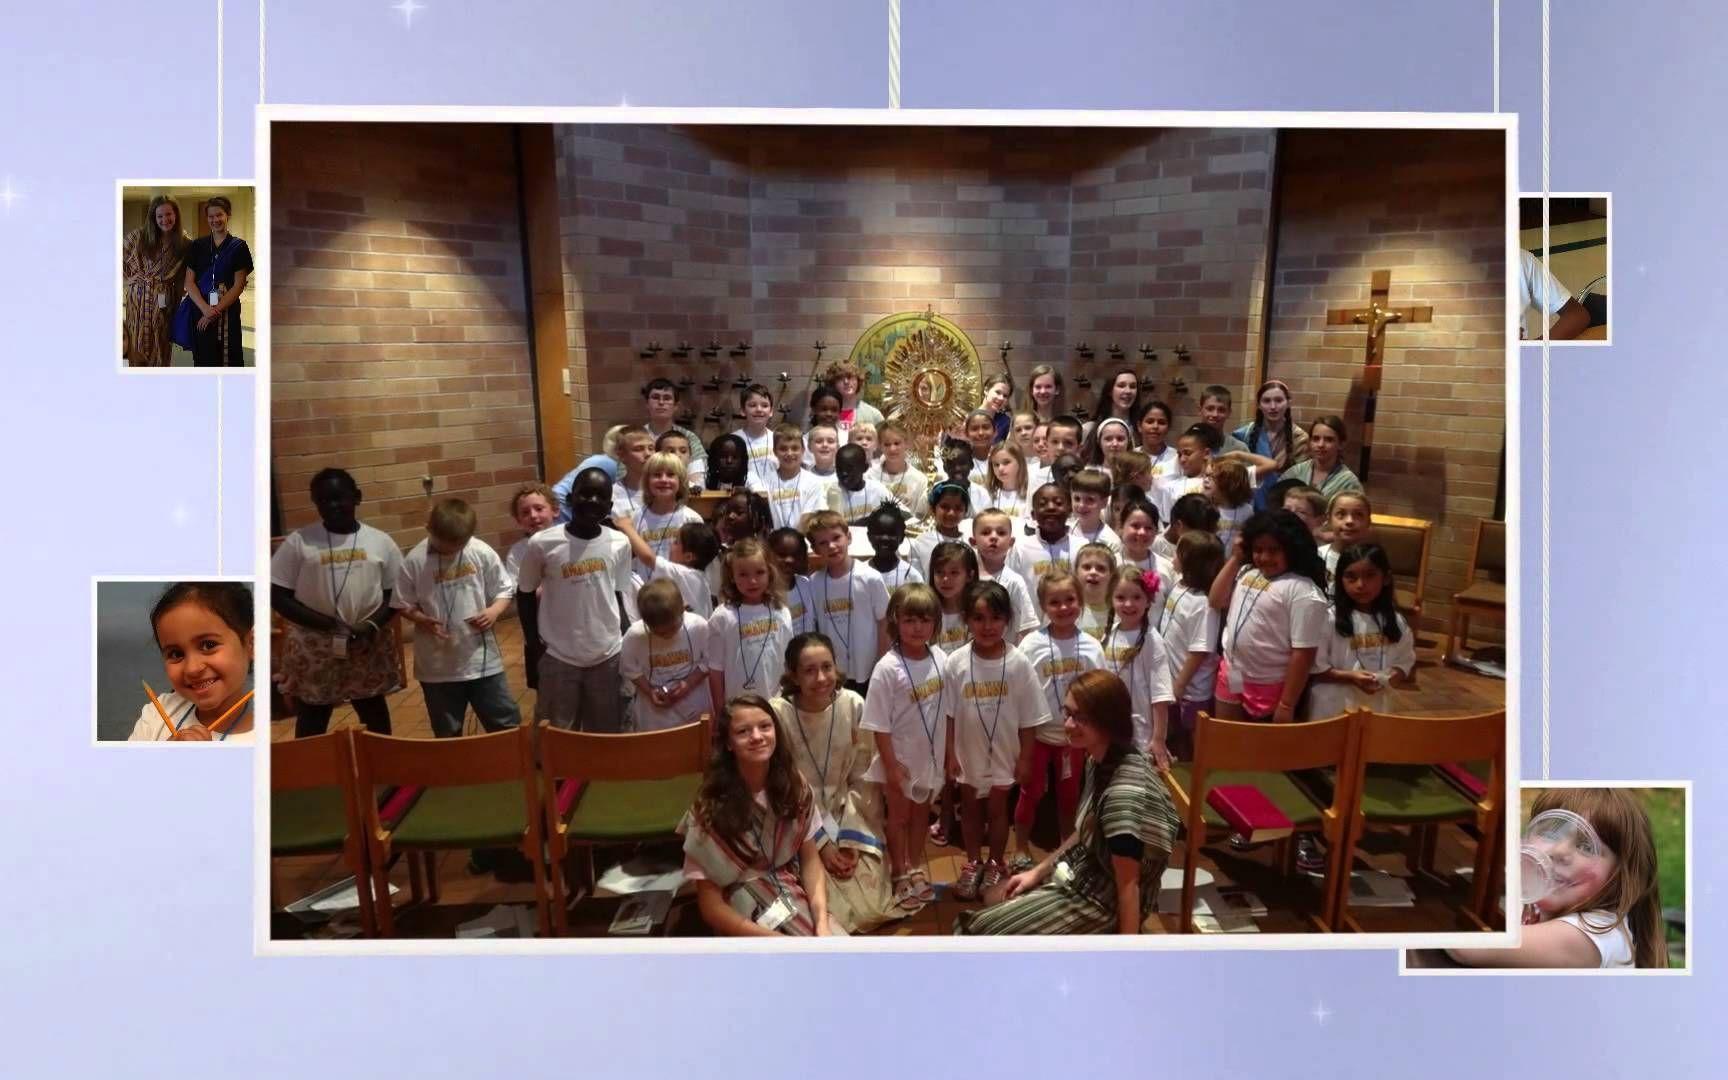 God Is Good Vbs Programs Highlights Snapshots From Prayer